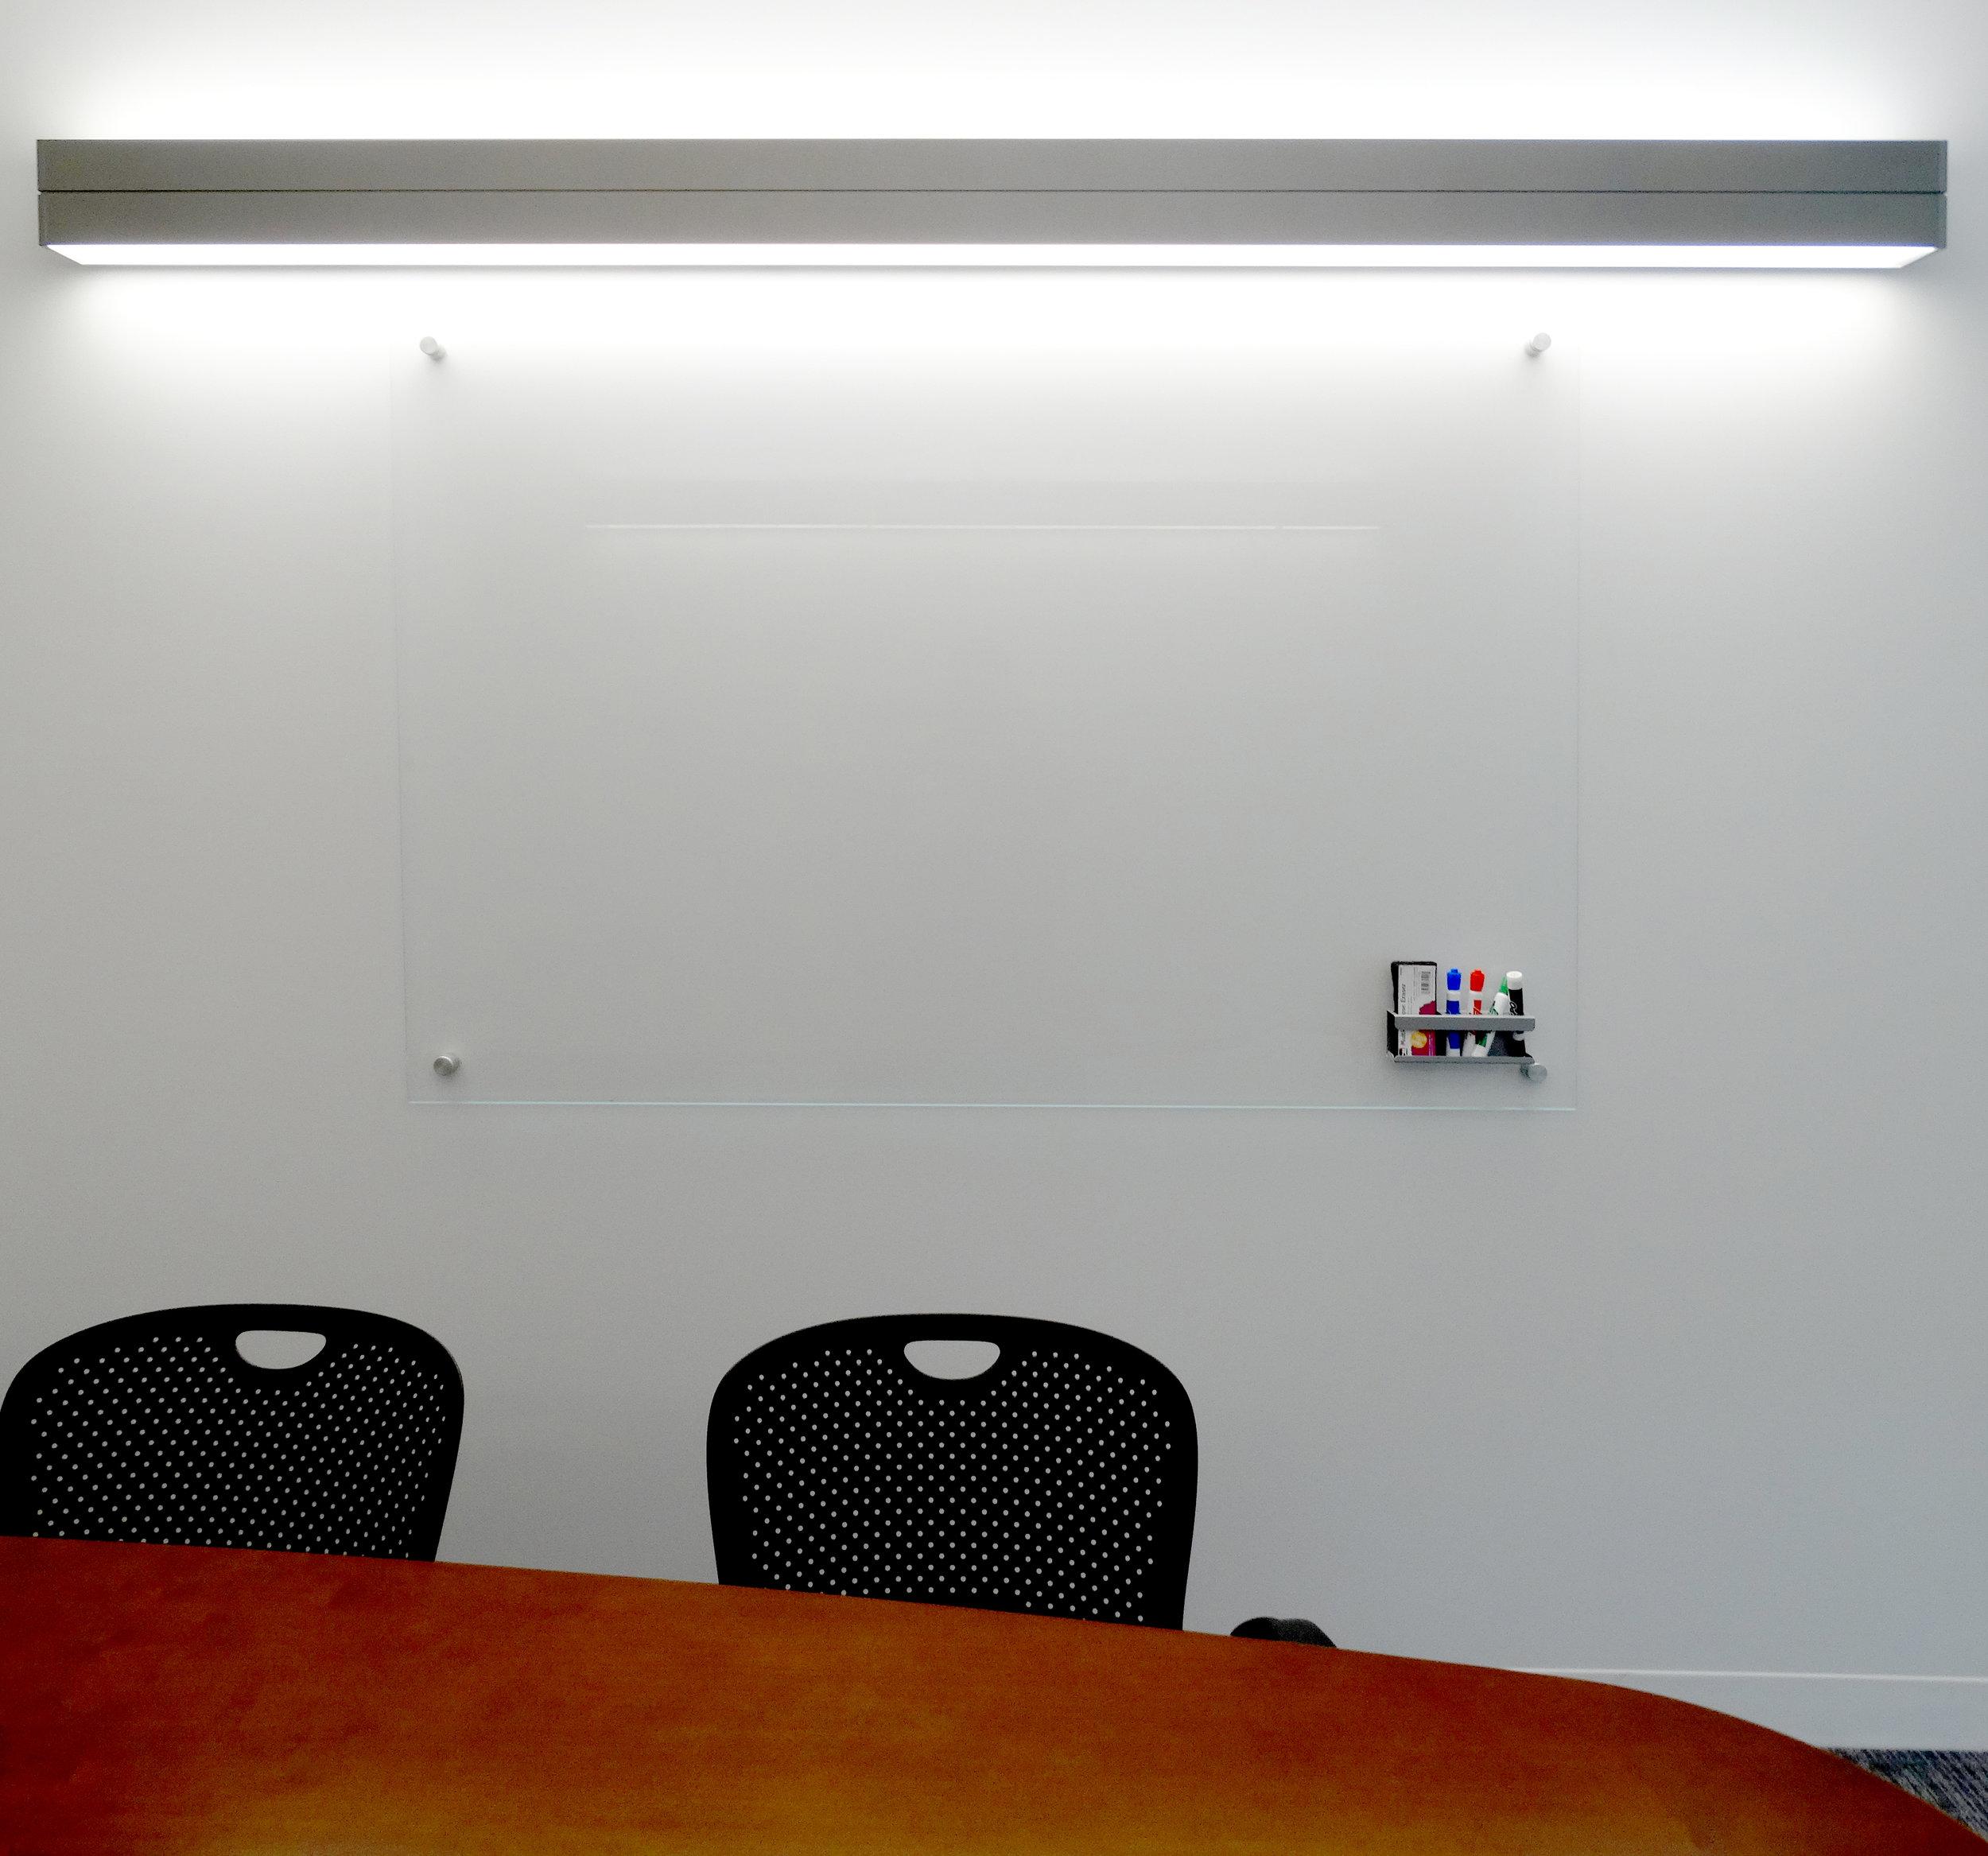 Clear Glass Marker Board Standoffs Office Wall - Spaceworks AI.jpg